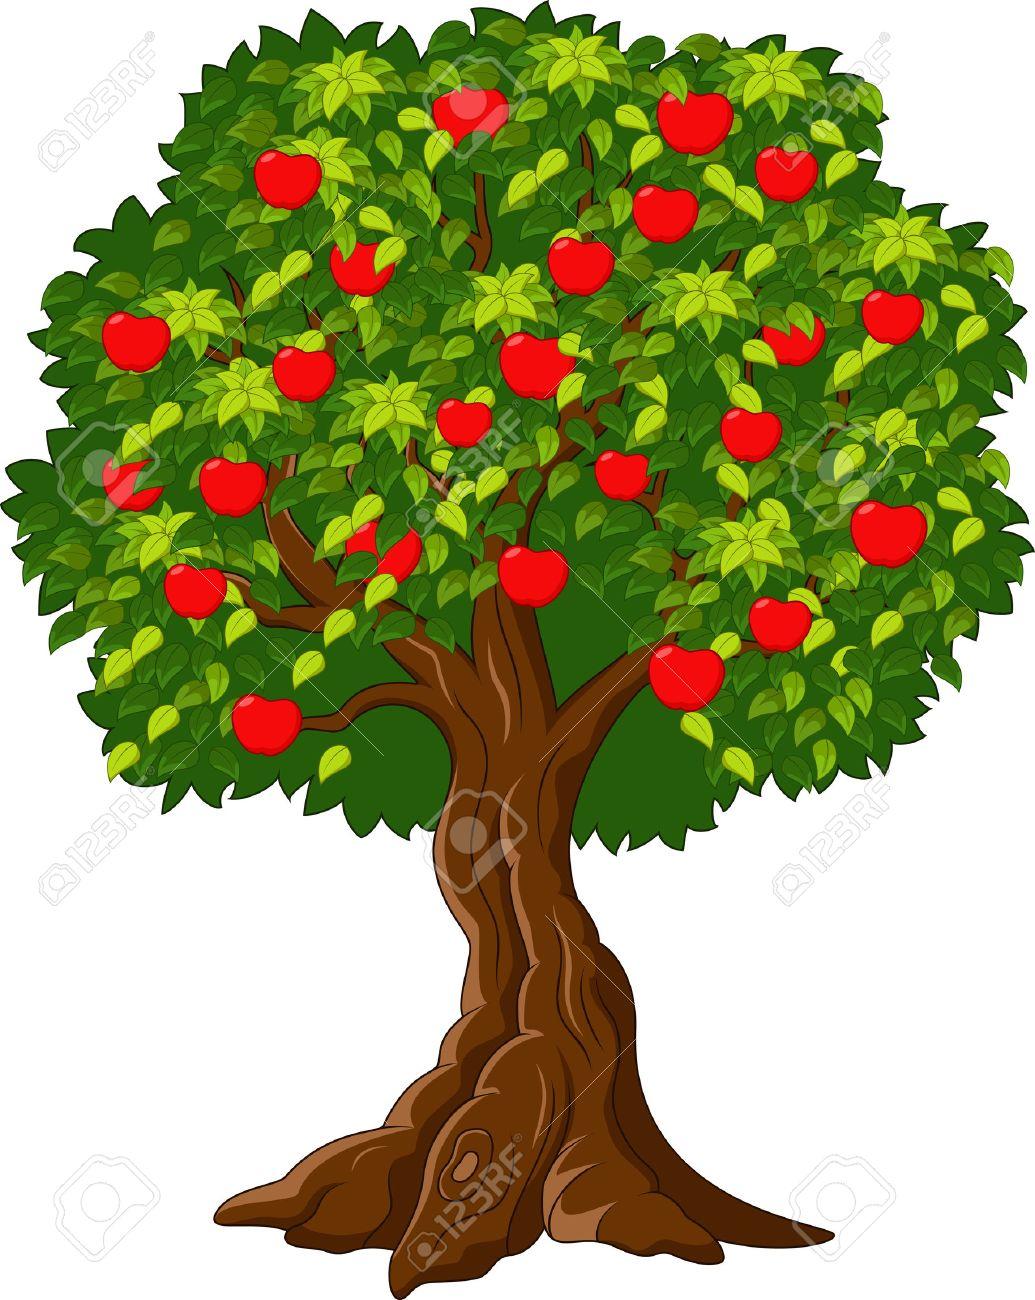 Mango clipart tree. Free download best